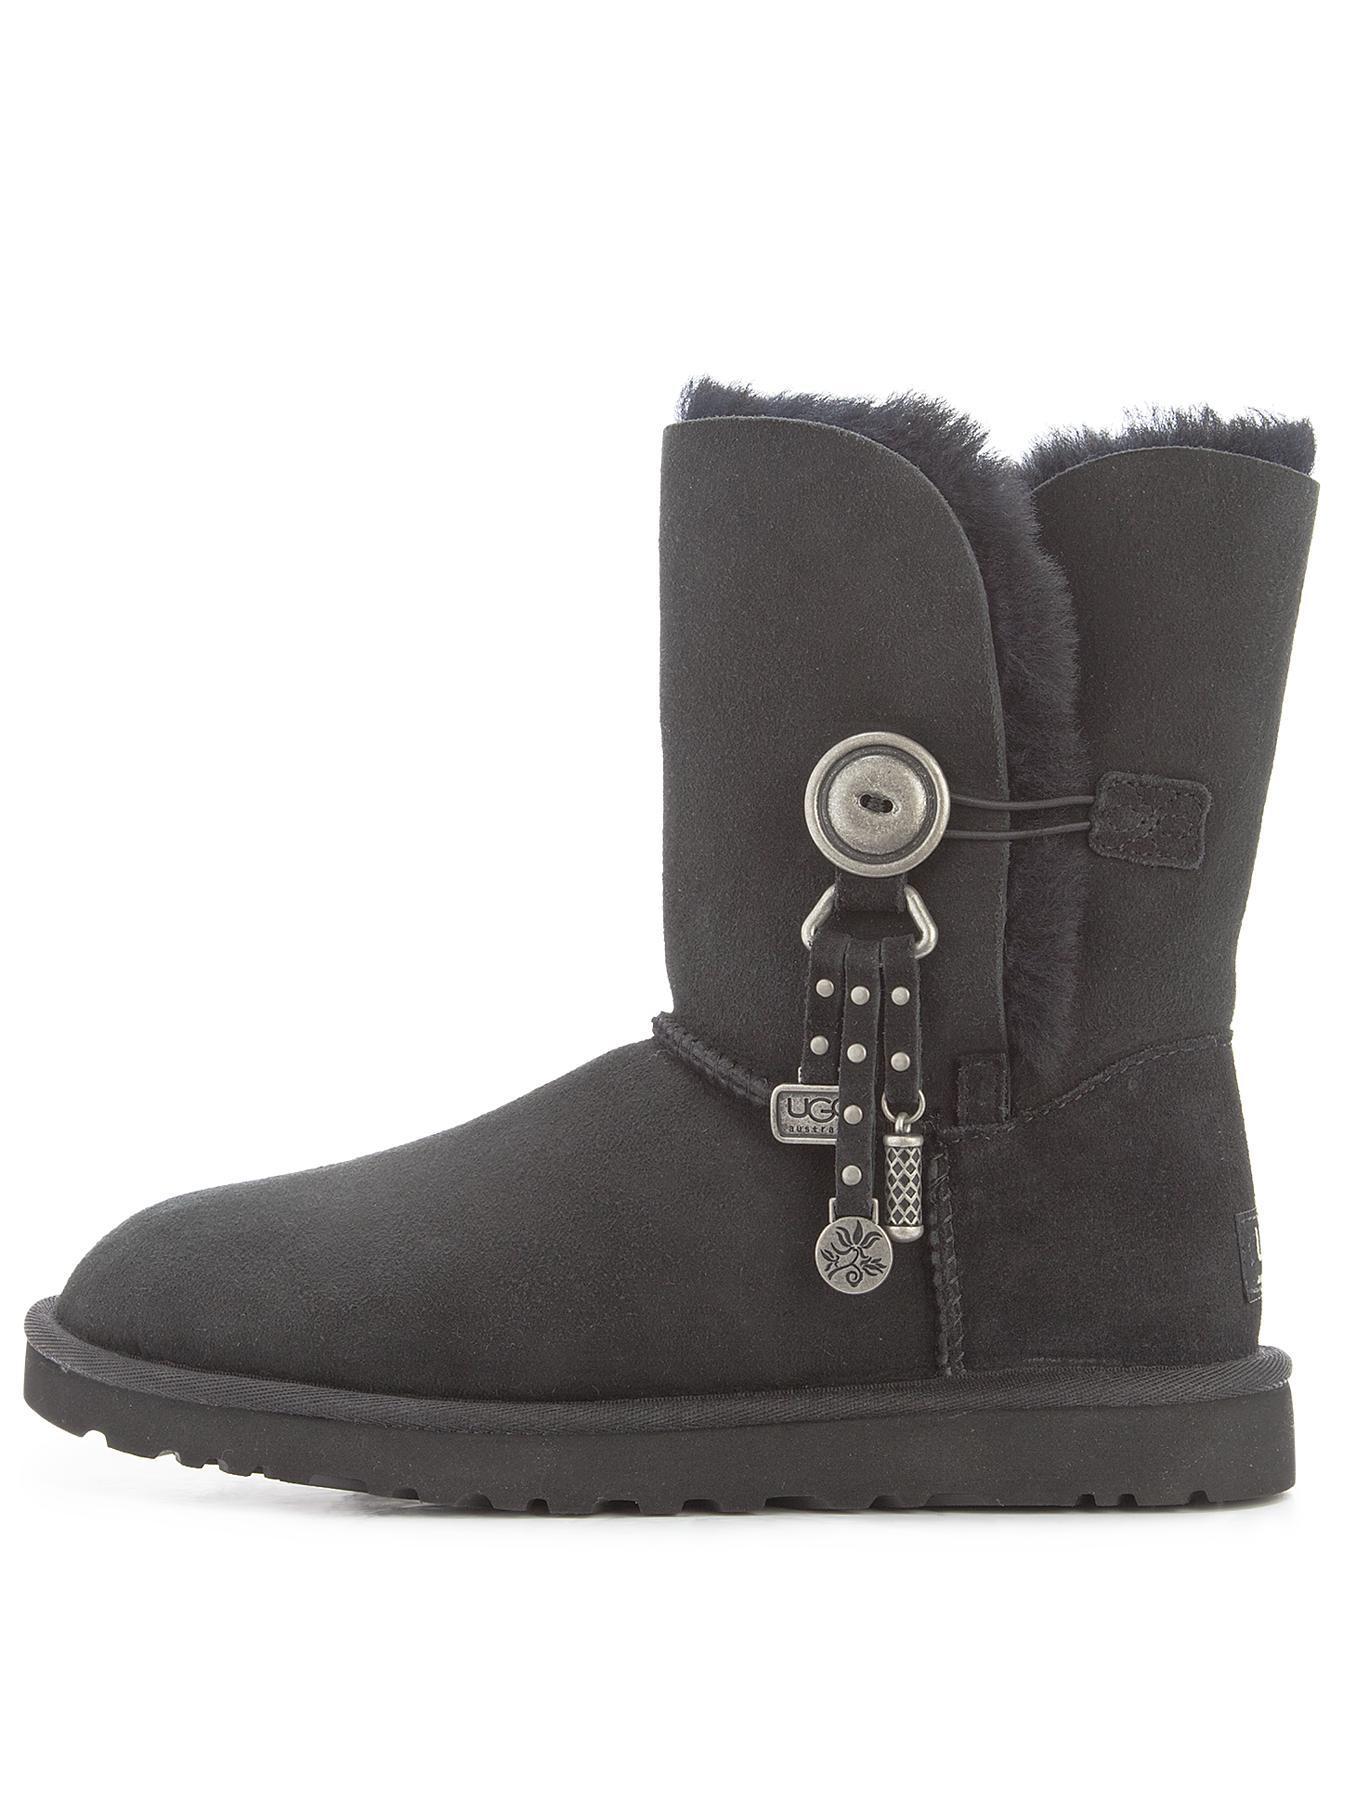 dbe784ed7f3 Ugg Australia Azalea Charm Boots